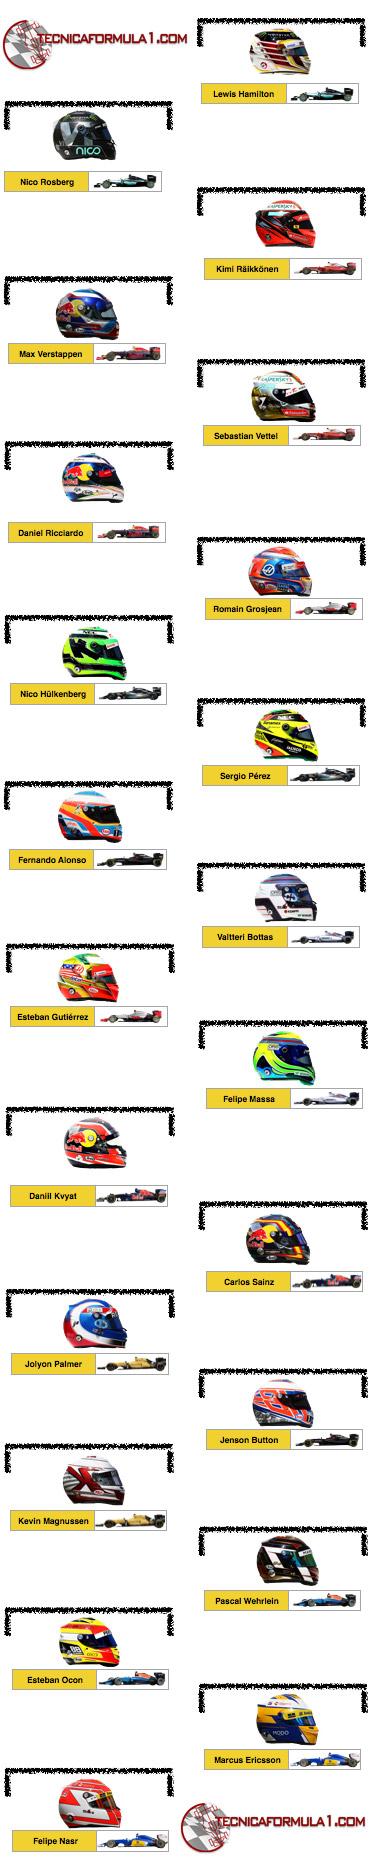 Parrilla De Salida Provisional Para El Gp De Brasil F1 2016 F1 Brazilgp Gp Mexico Gran Premio De Mexico Fórmula 1